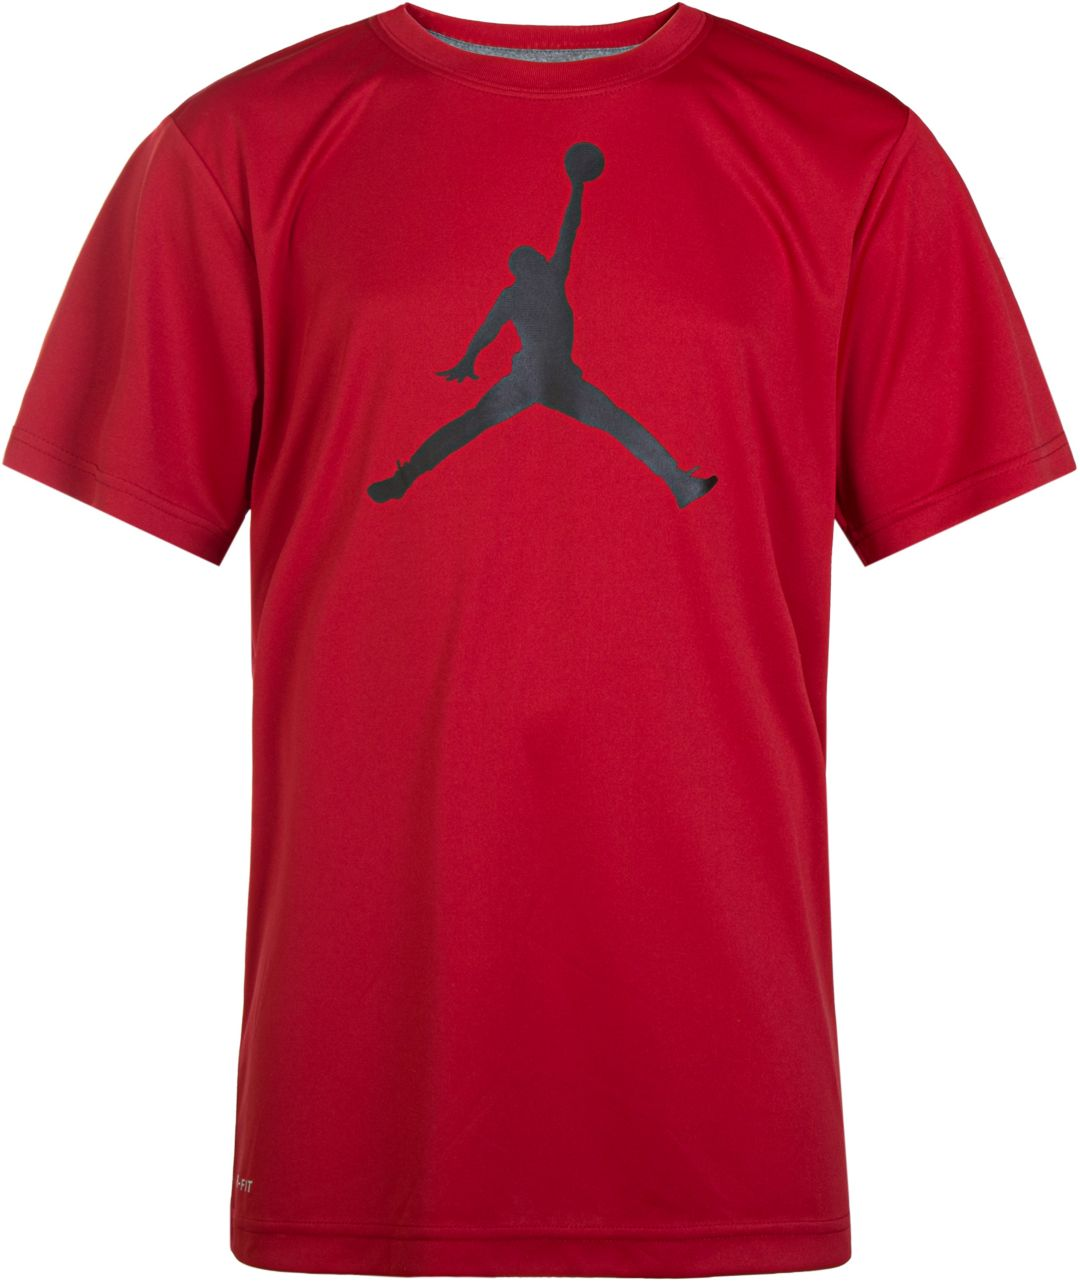 prix compétitif b8e8b d8dbc Jordan Boys' Jumpman Logo Dri-FIT T-Shirt